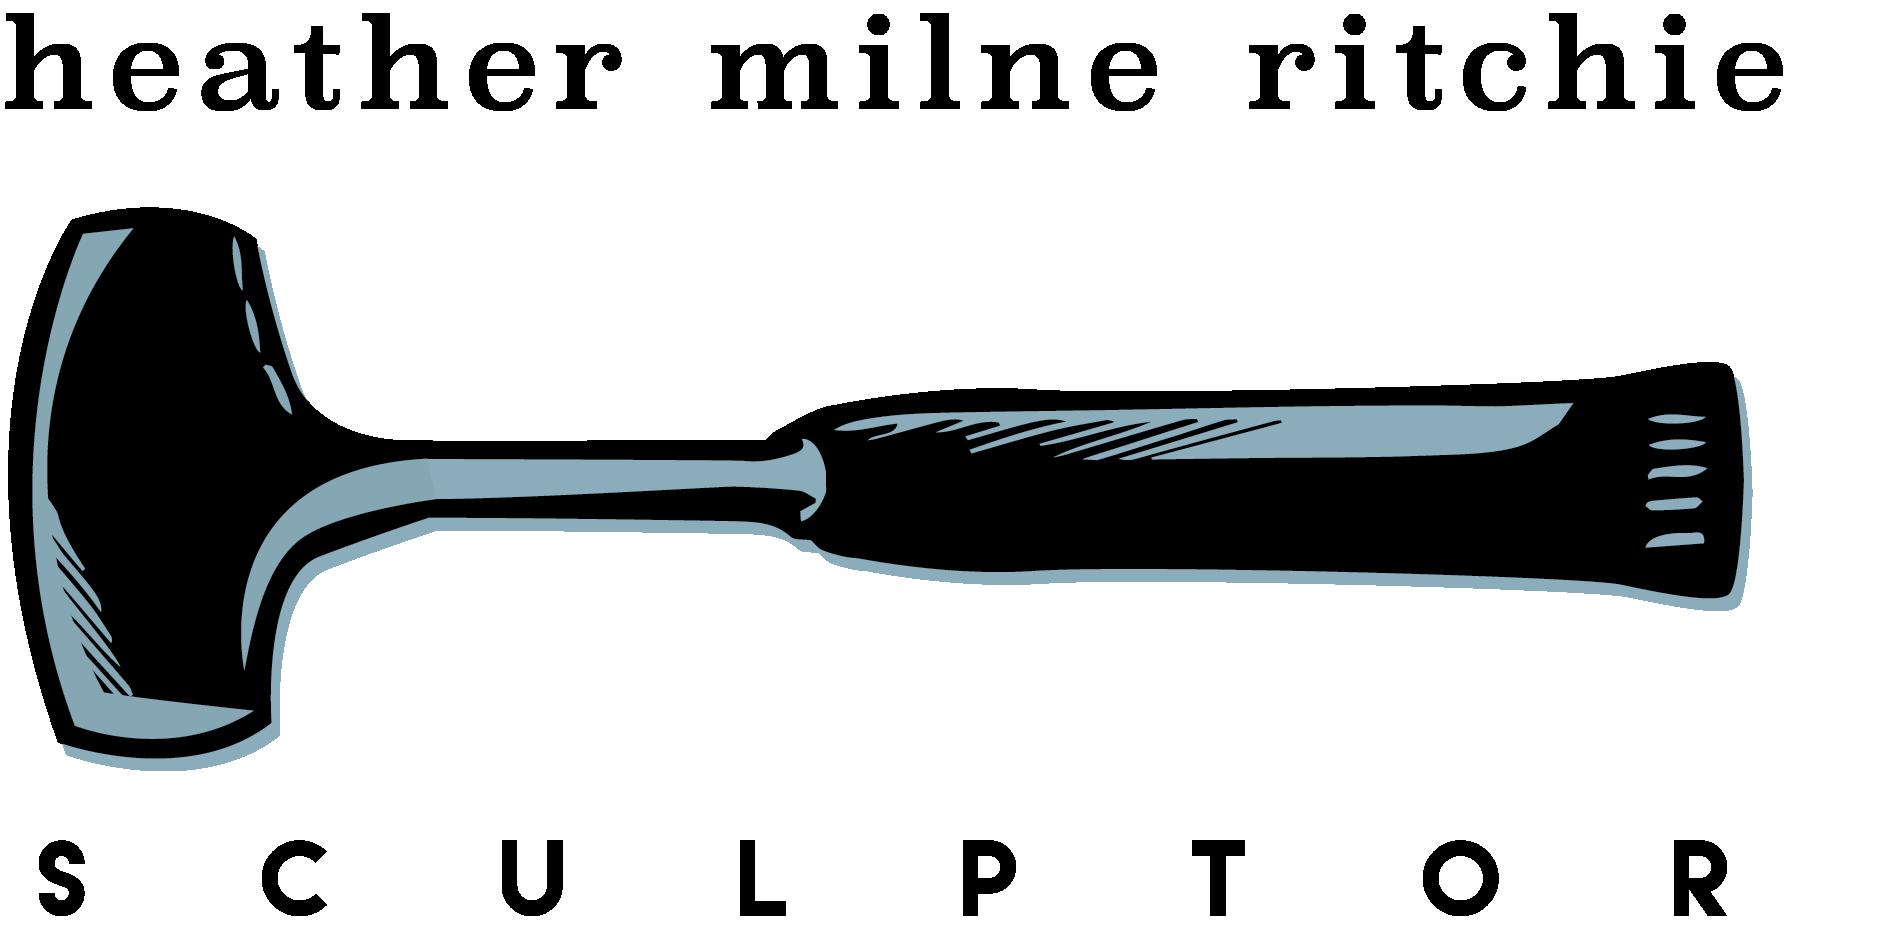 heathermilne_logo.png